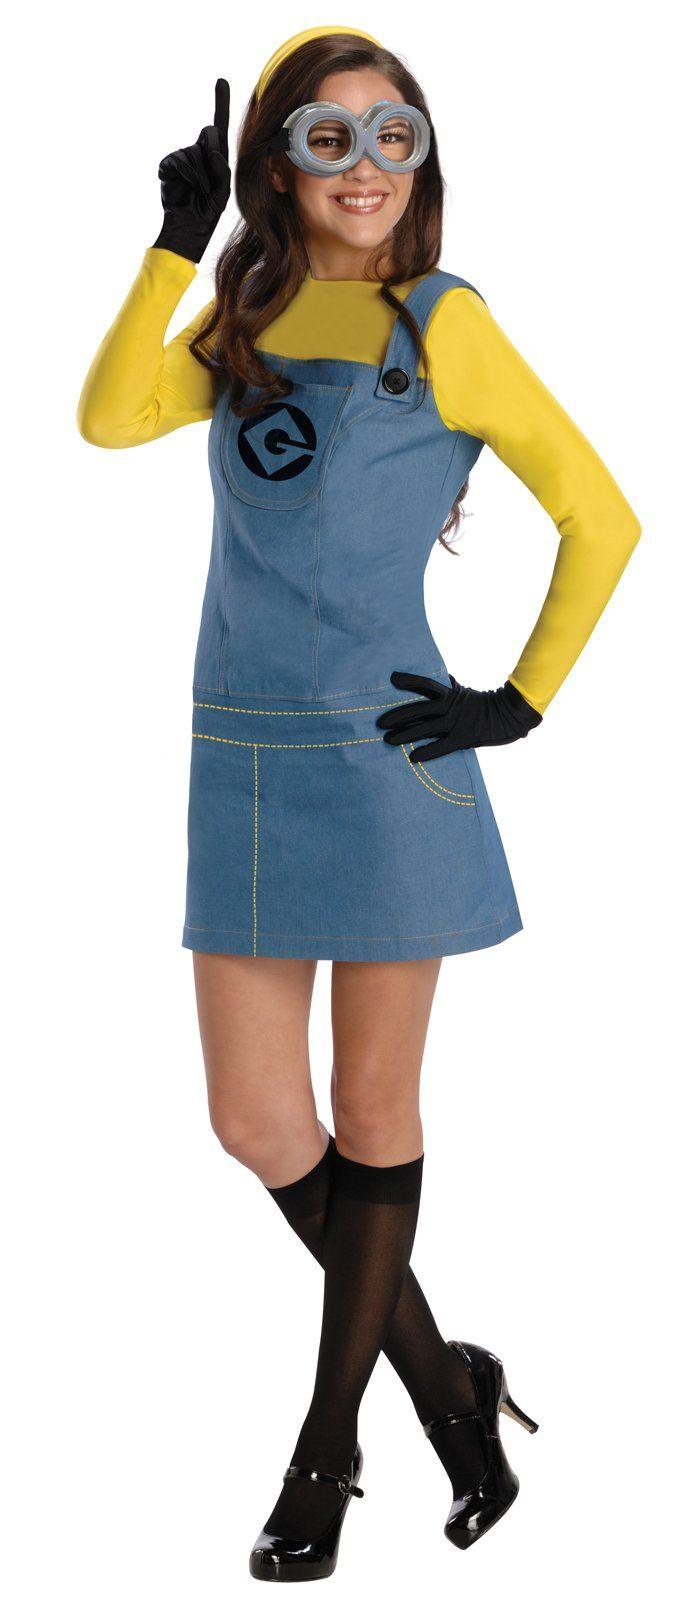 best costumes images on pinterest children costumes halloween